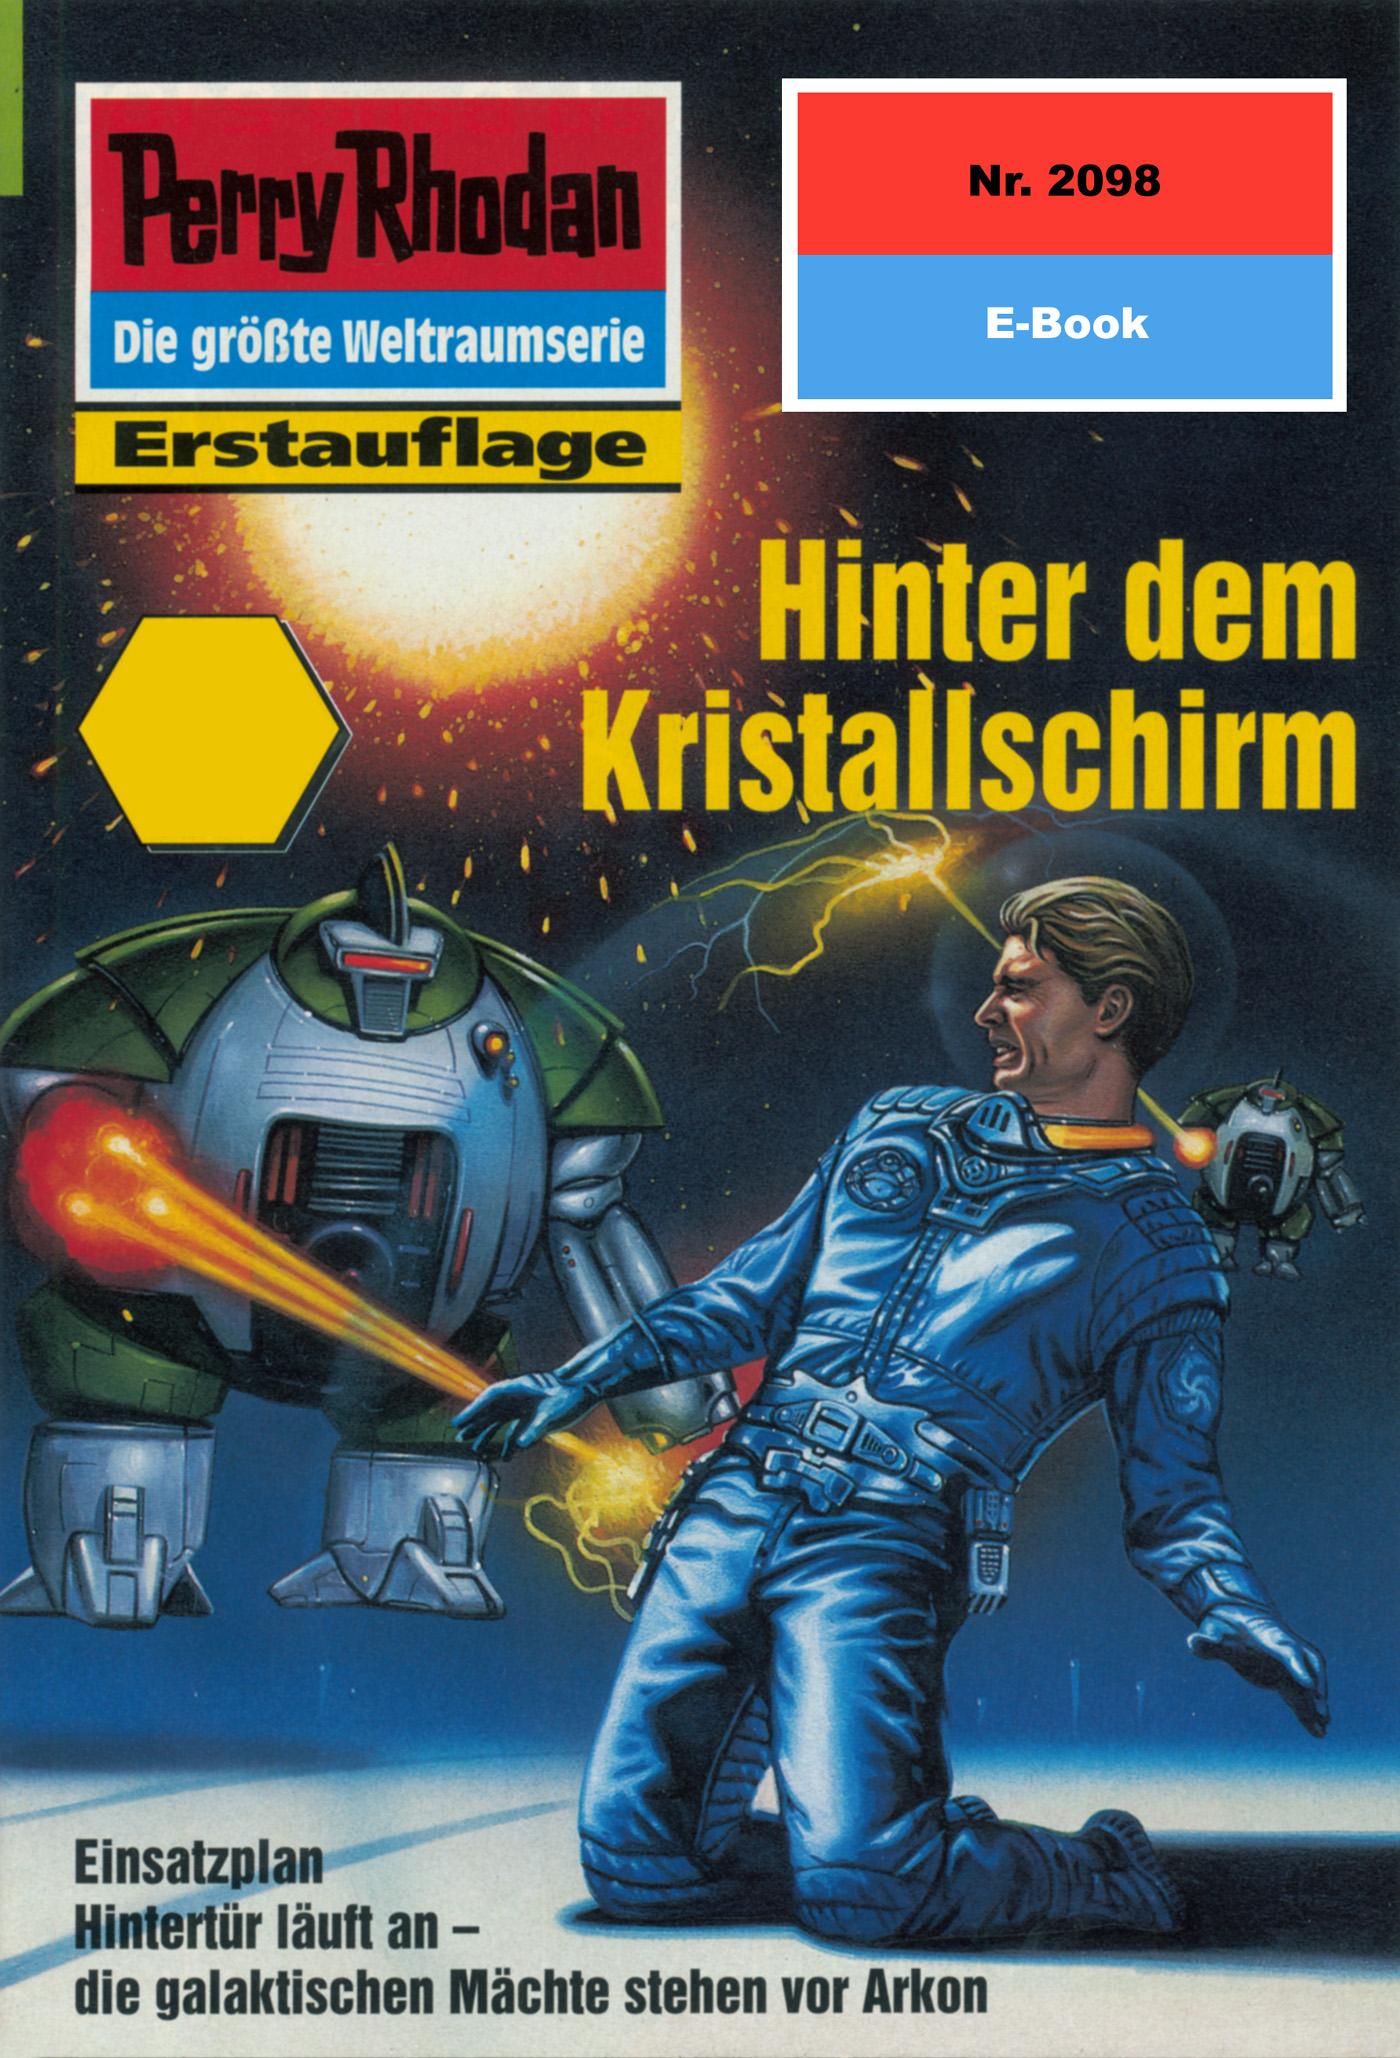 Rainer Castor Perry Rhodan 2098: Hinter dem Kristallschirm босоножки fenyaie 2098 2015